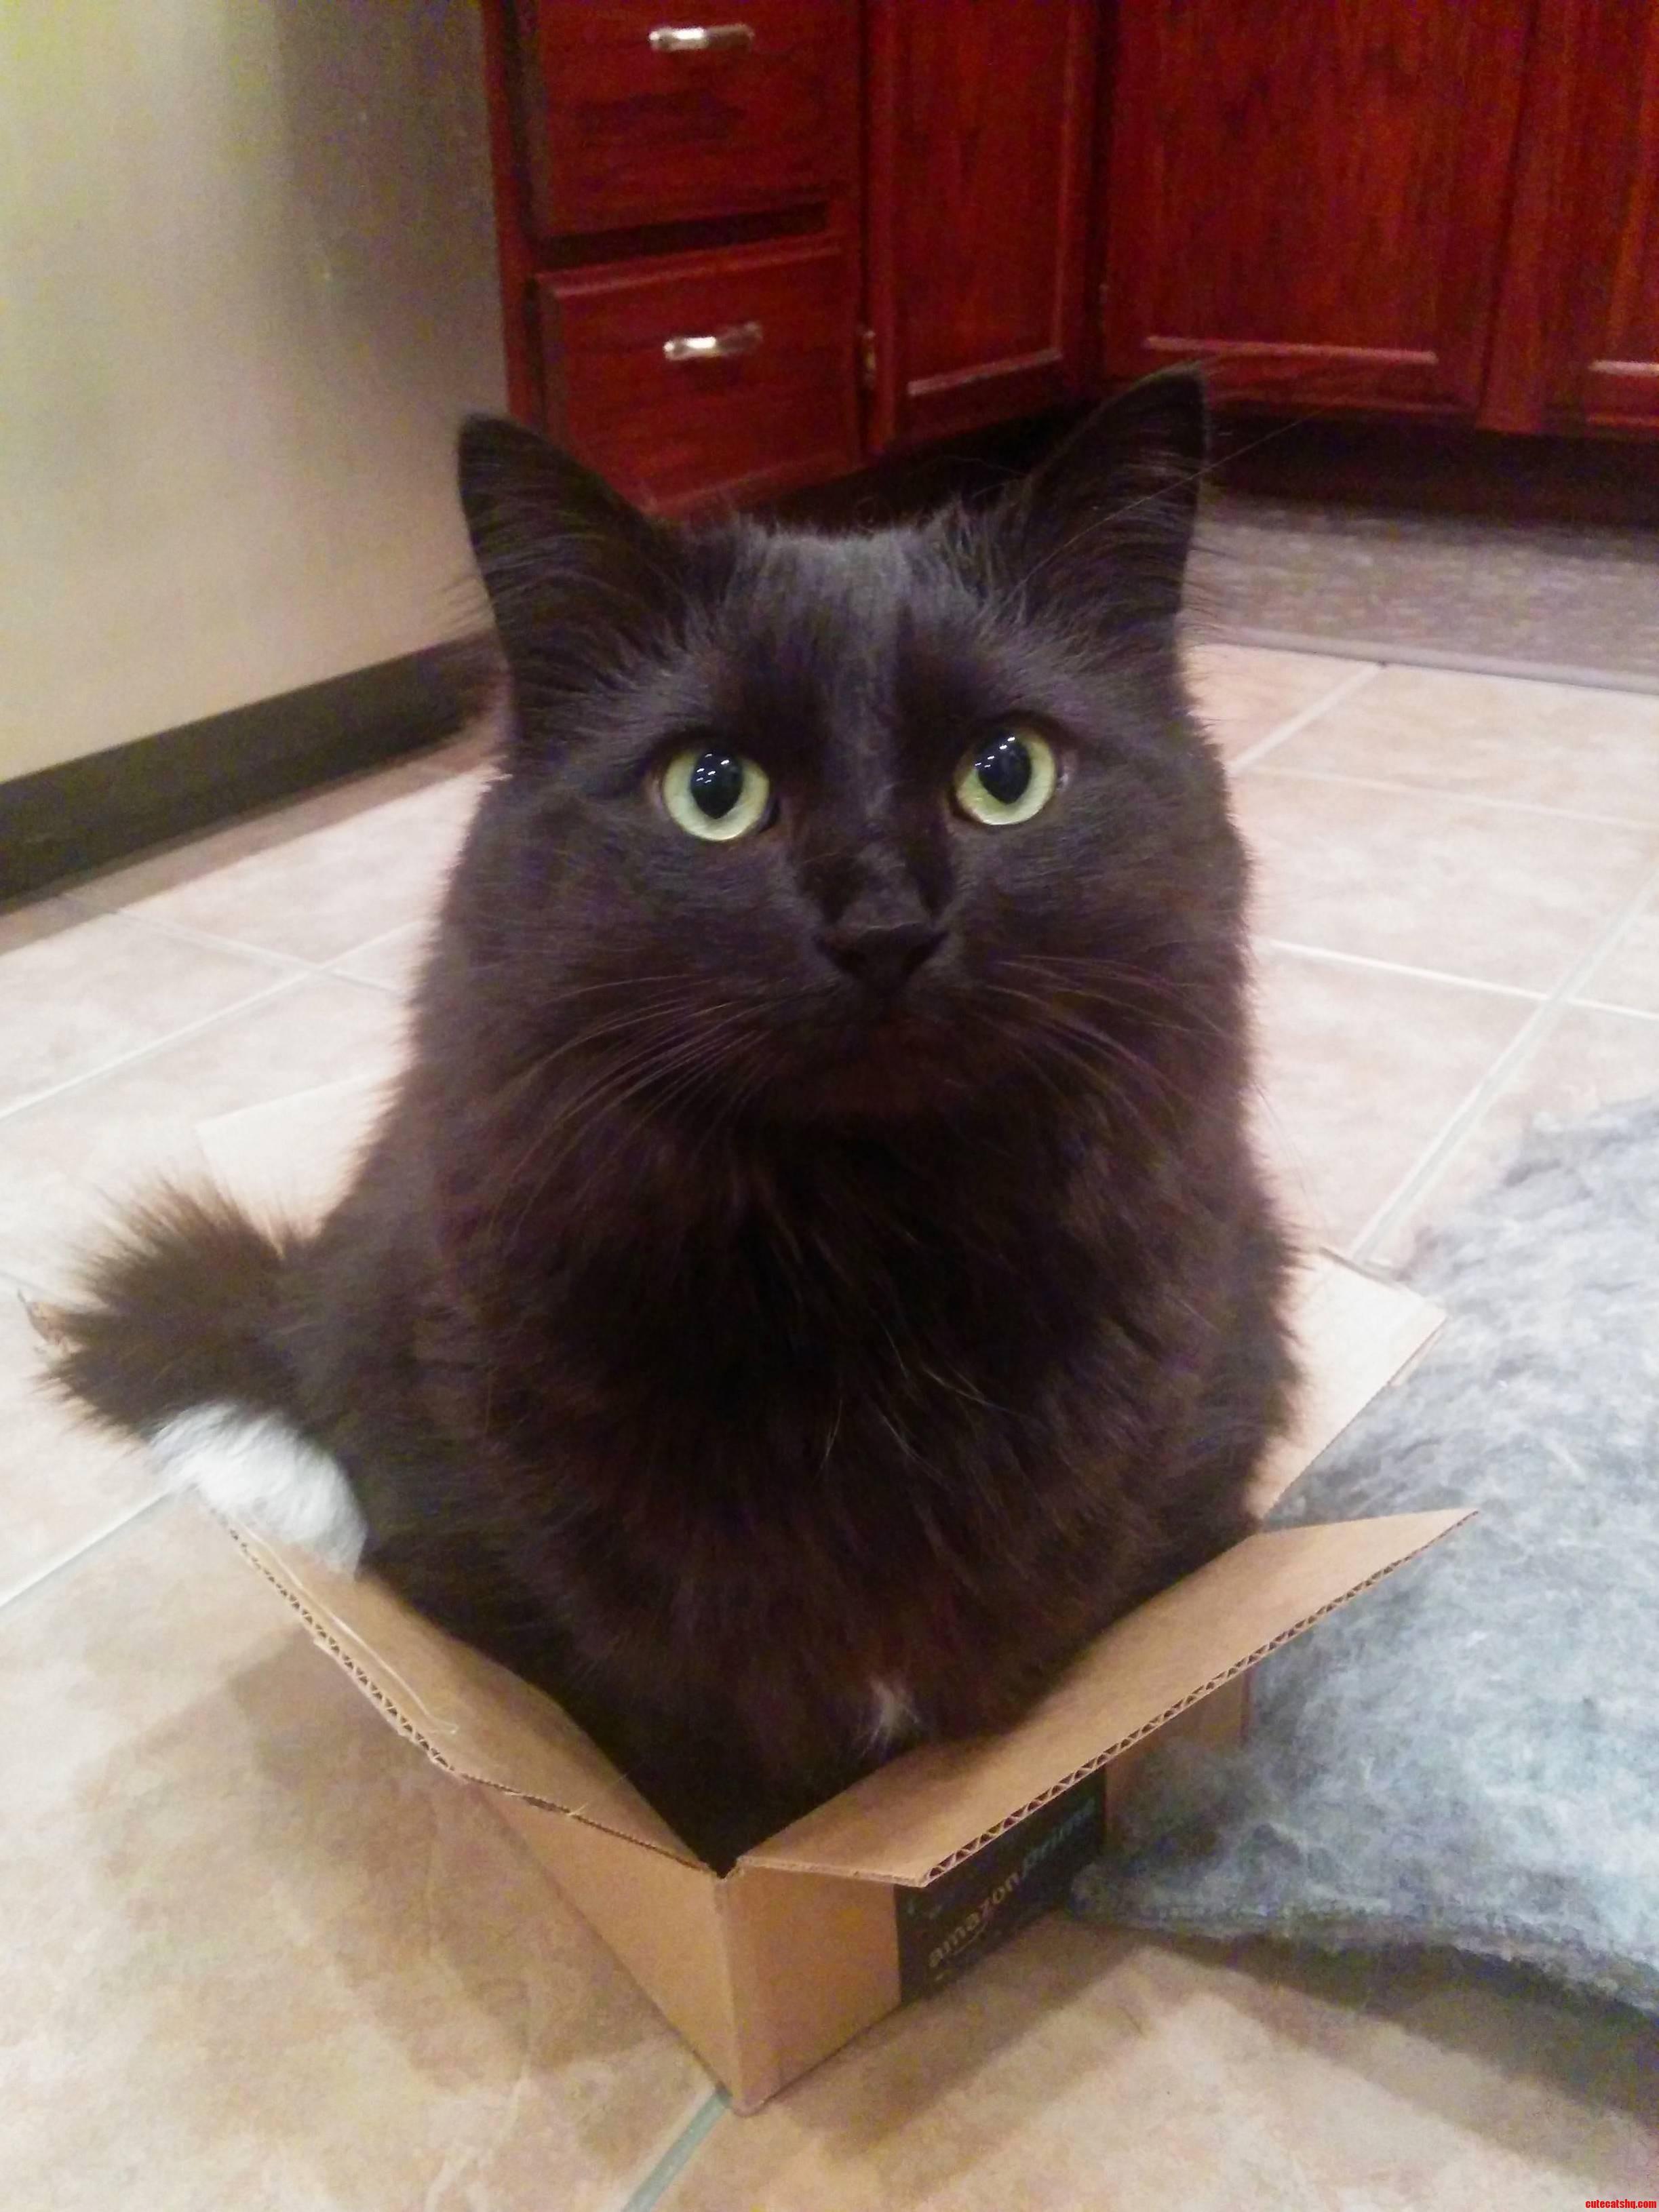 Just a peanut in a box.